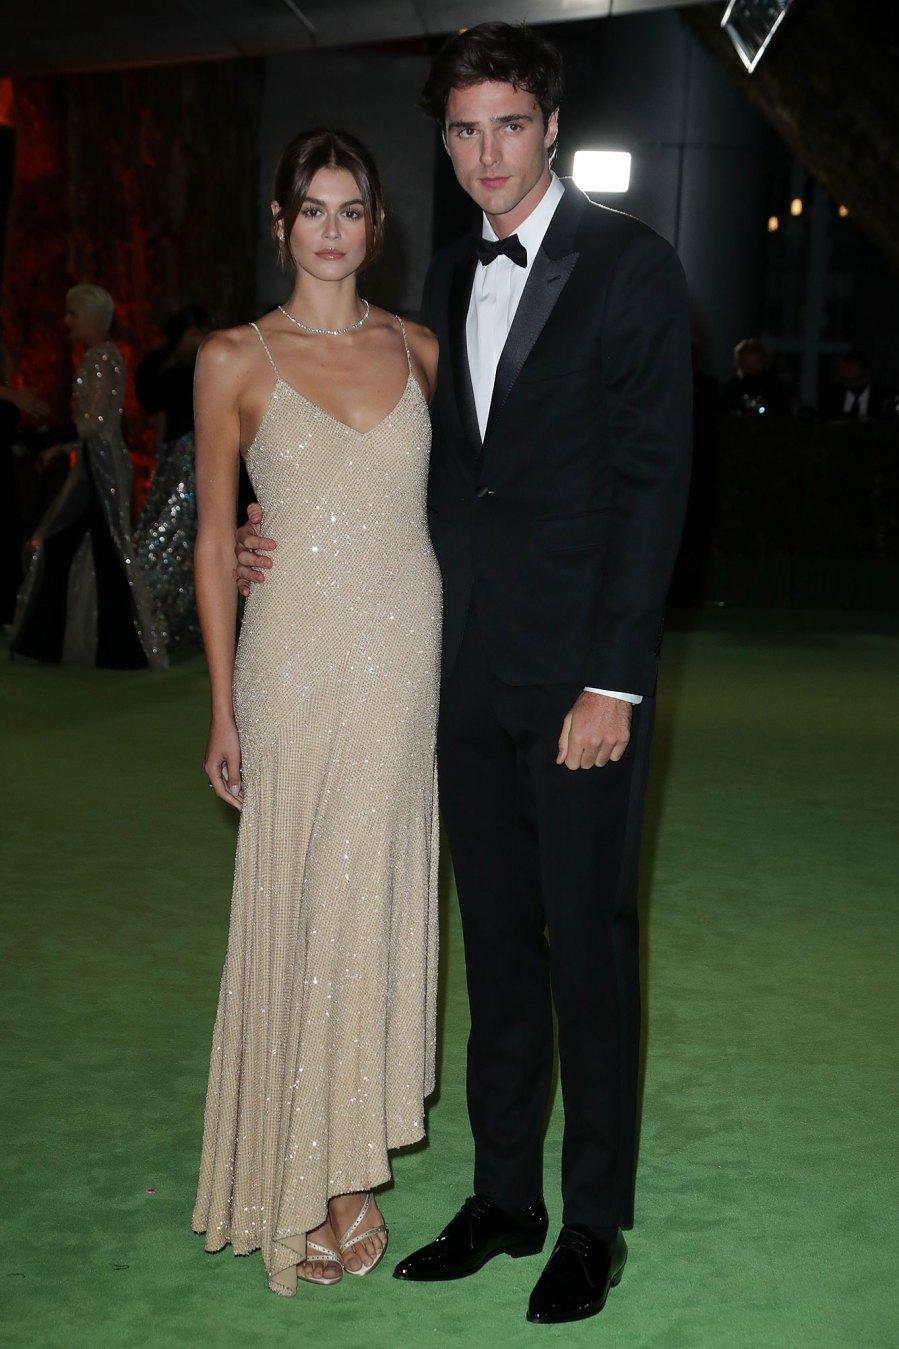 Swoon! Jacob Elordi, Kaia Gerber Make a Fashion Forward Red Carpet Debut